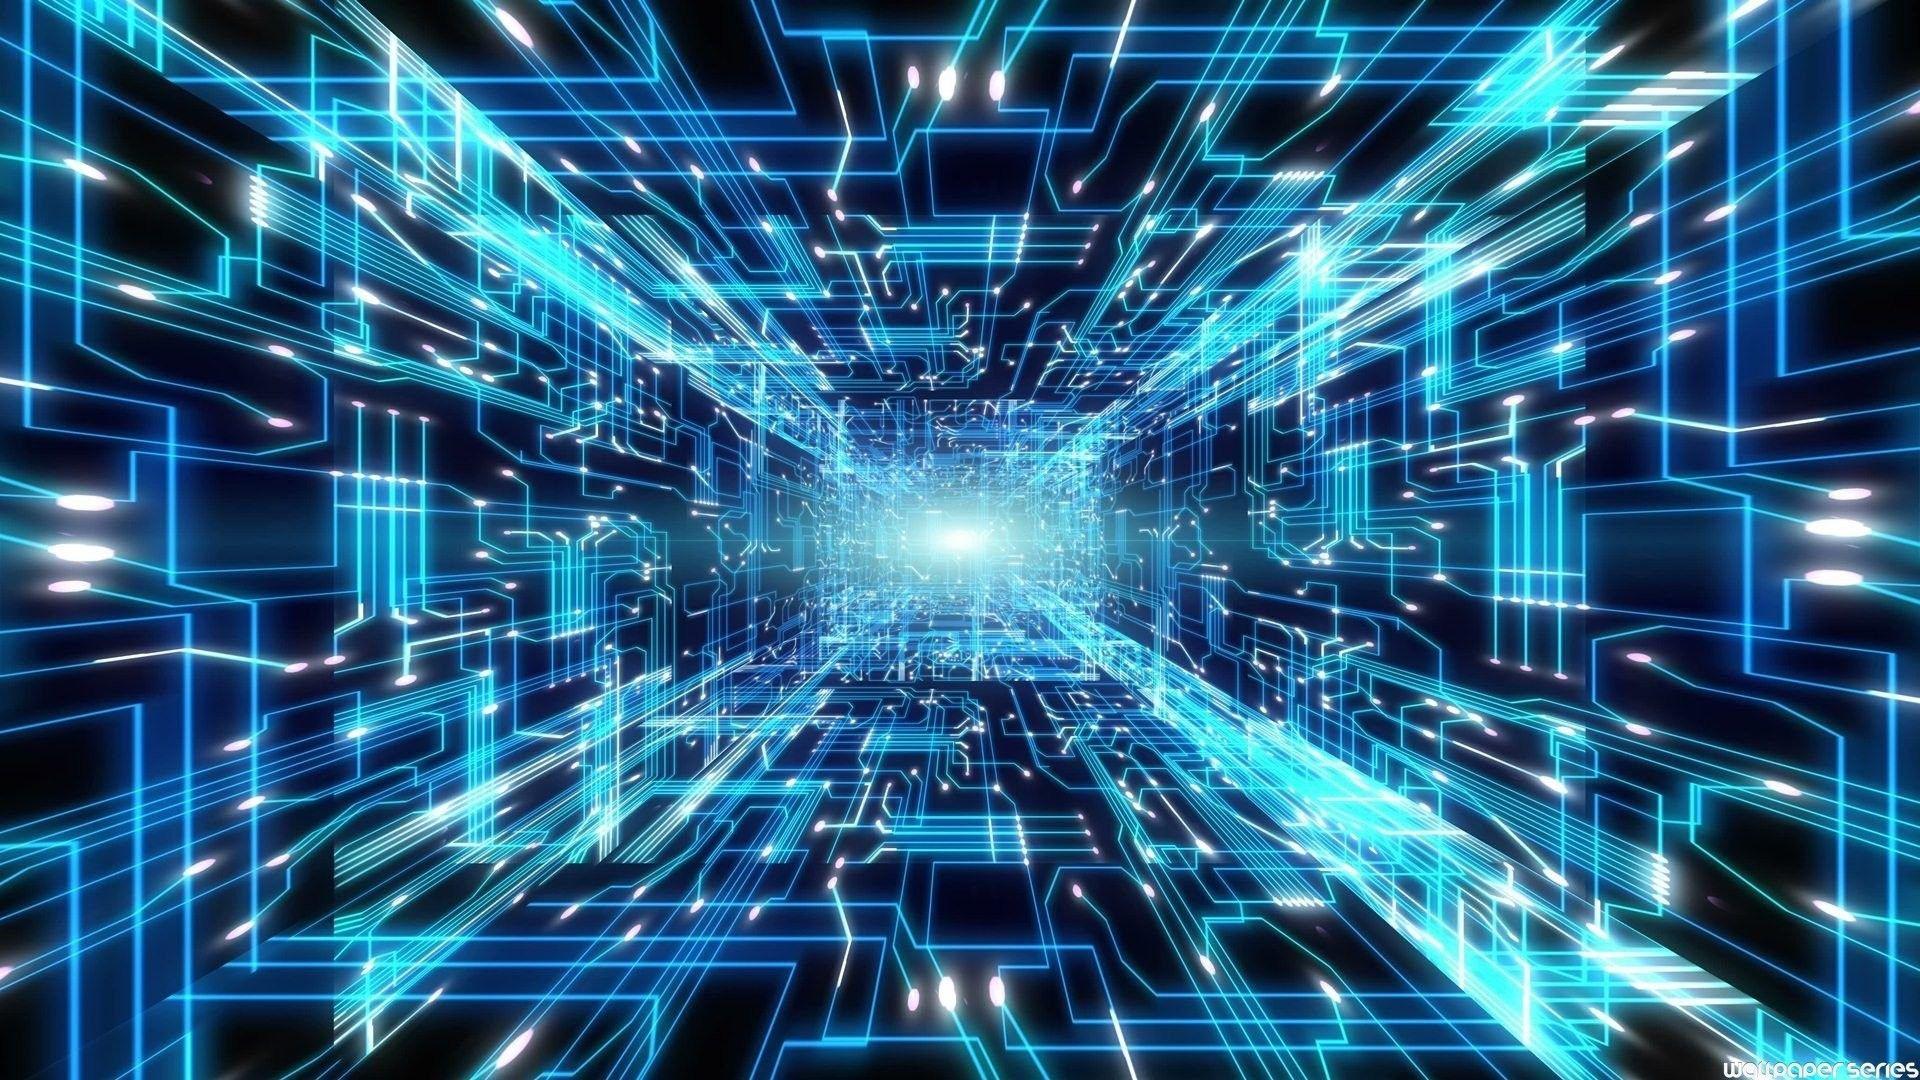 4k Tech Wallpapers Top Free 4k Tech Backgrounds